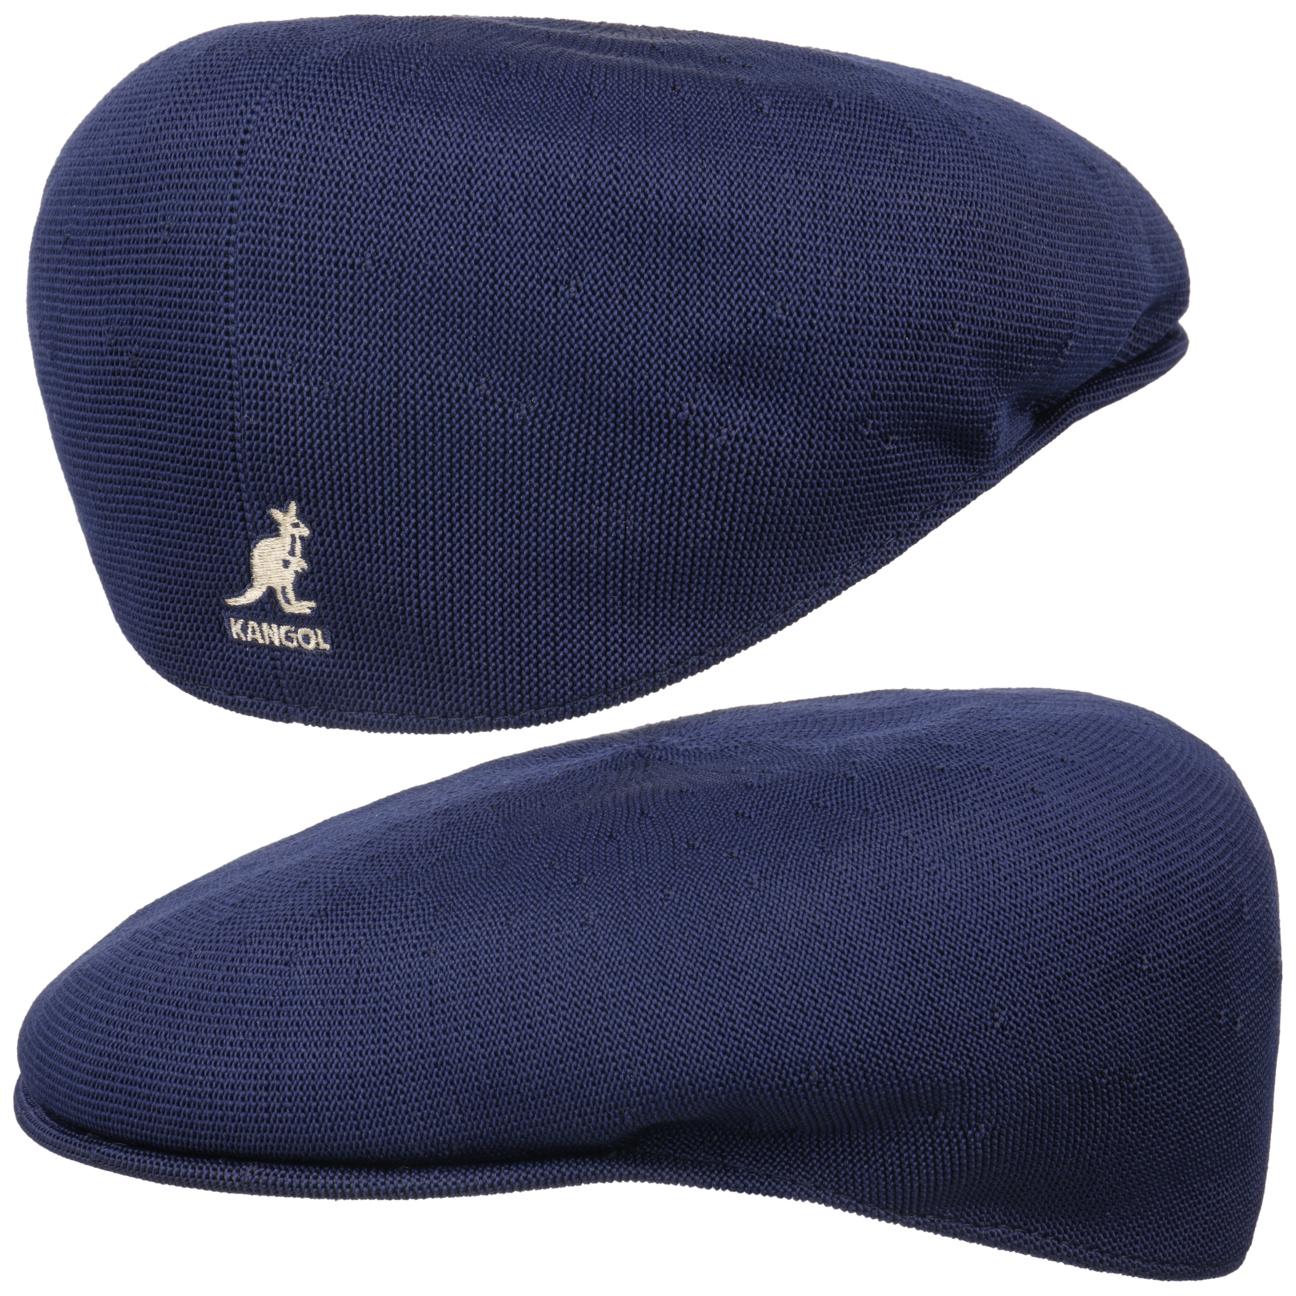 Gorra Gatsby Kangol Tropic 504 - Gorras - sombreroshop.es 48111c4e733